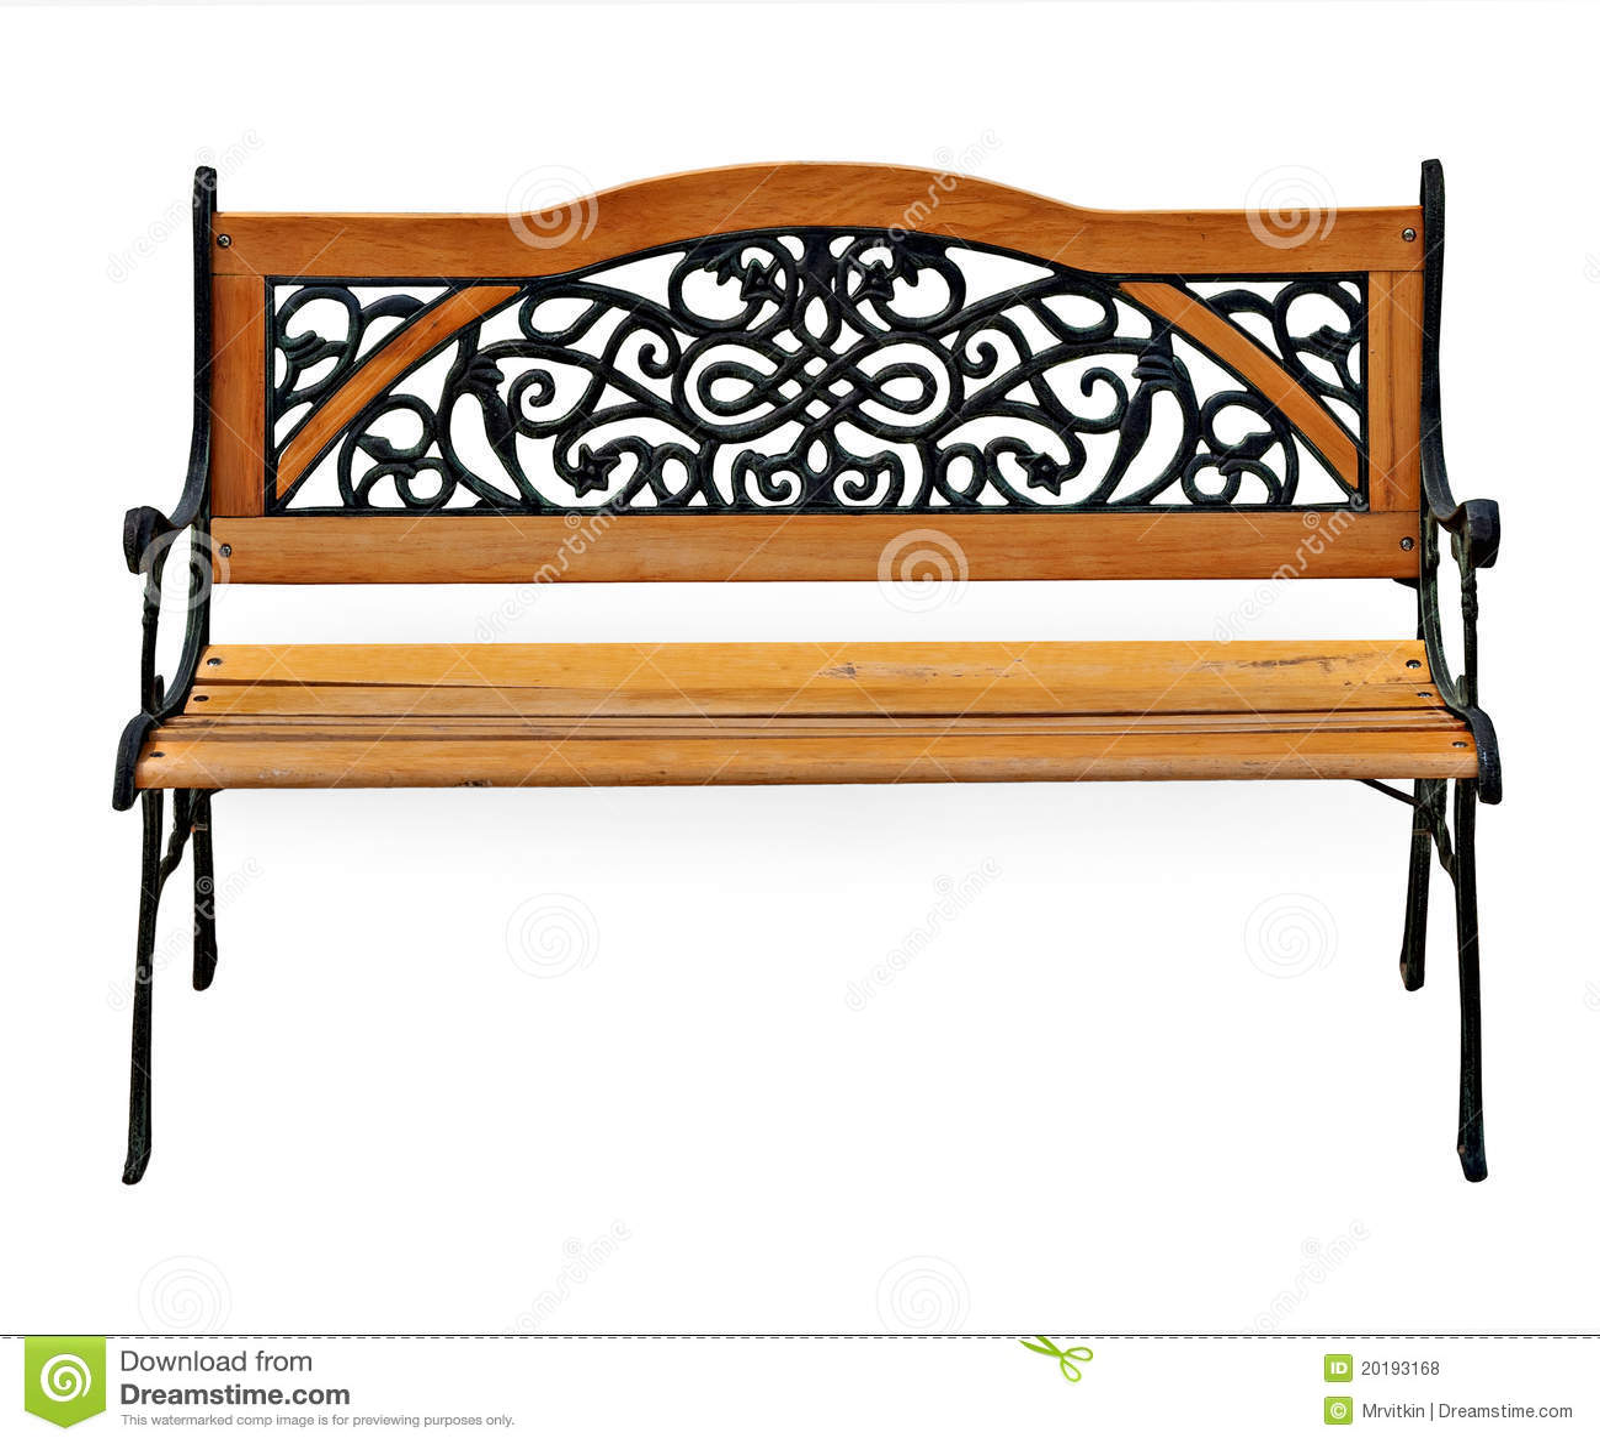 banco de jardim de ferro fundido:Cast Iron and Wood Garden Bench #B05111 1300x1190